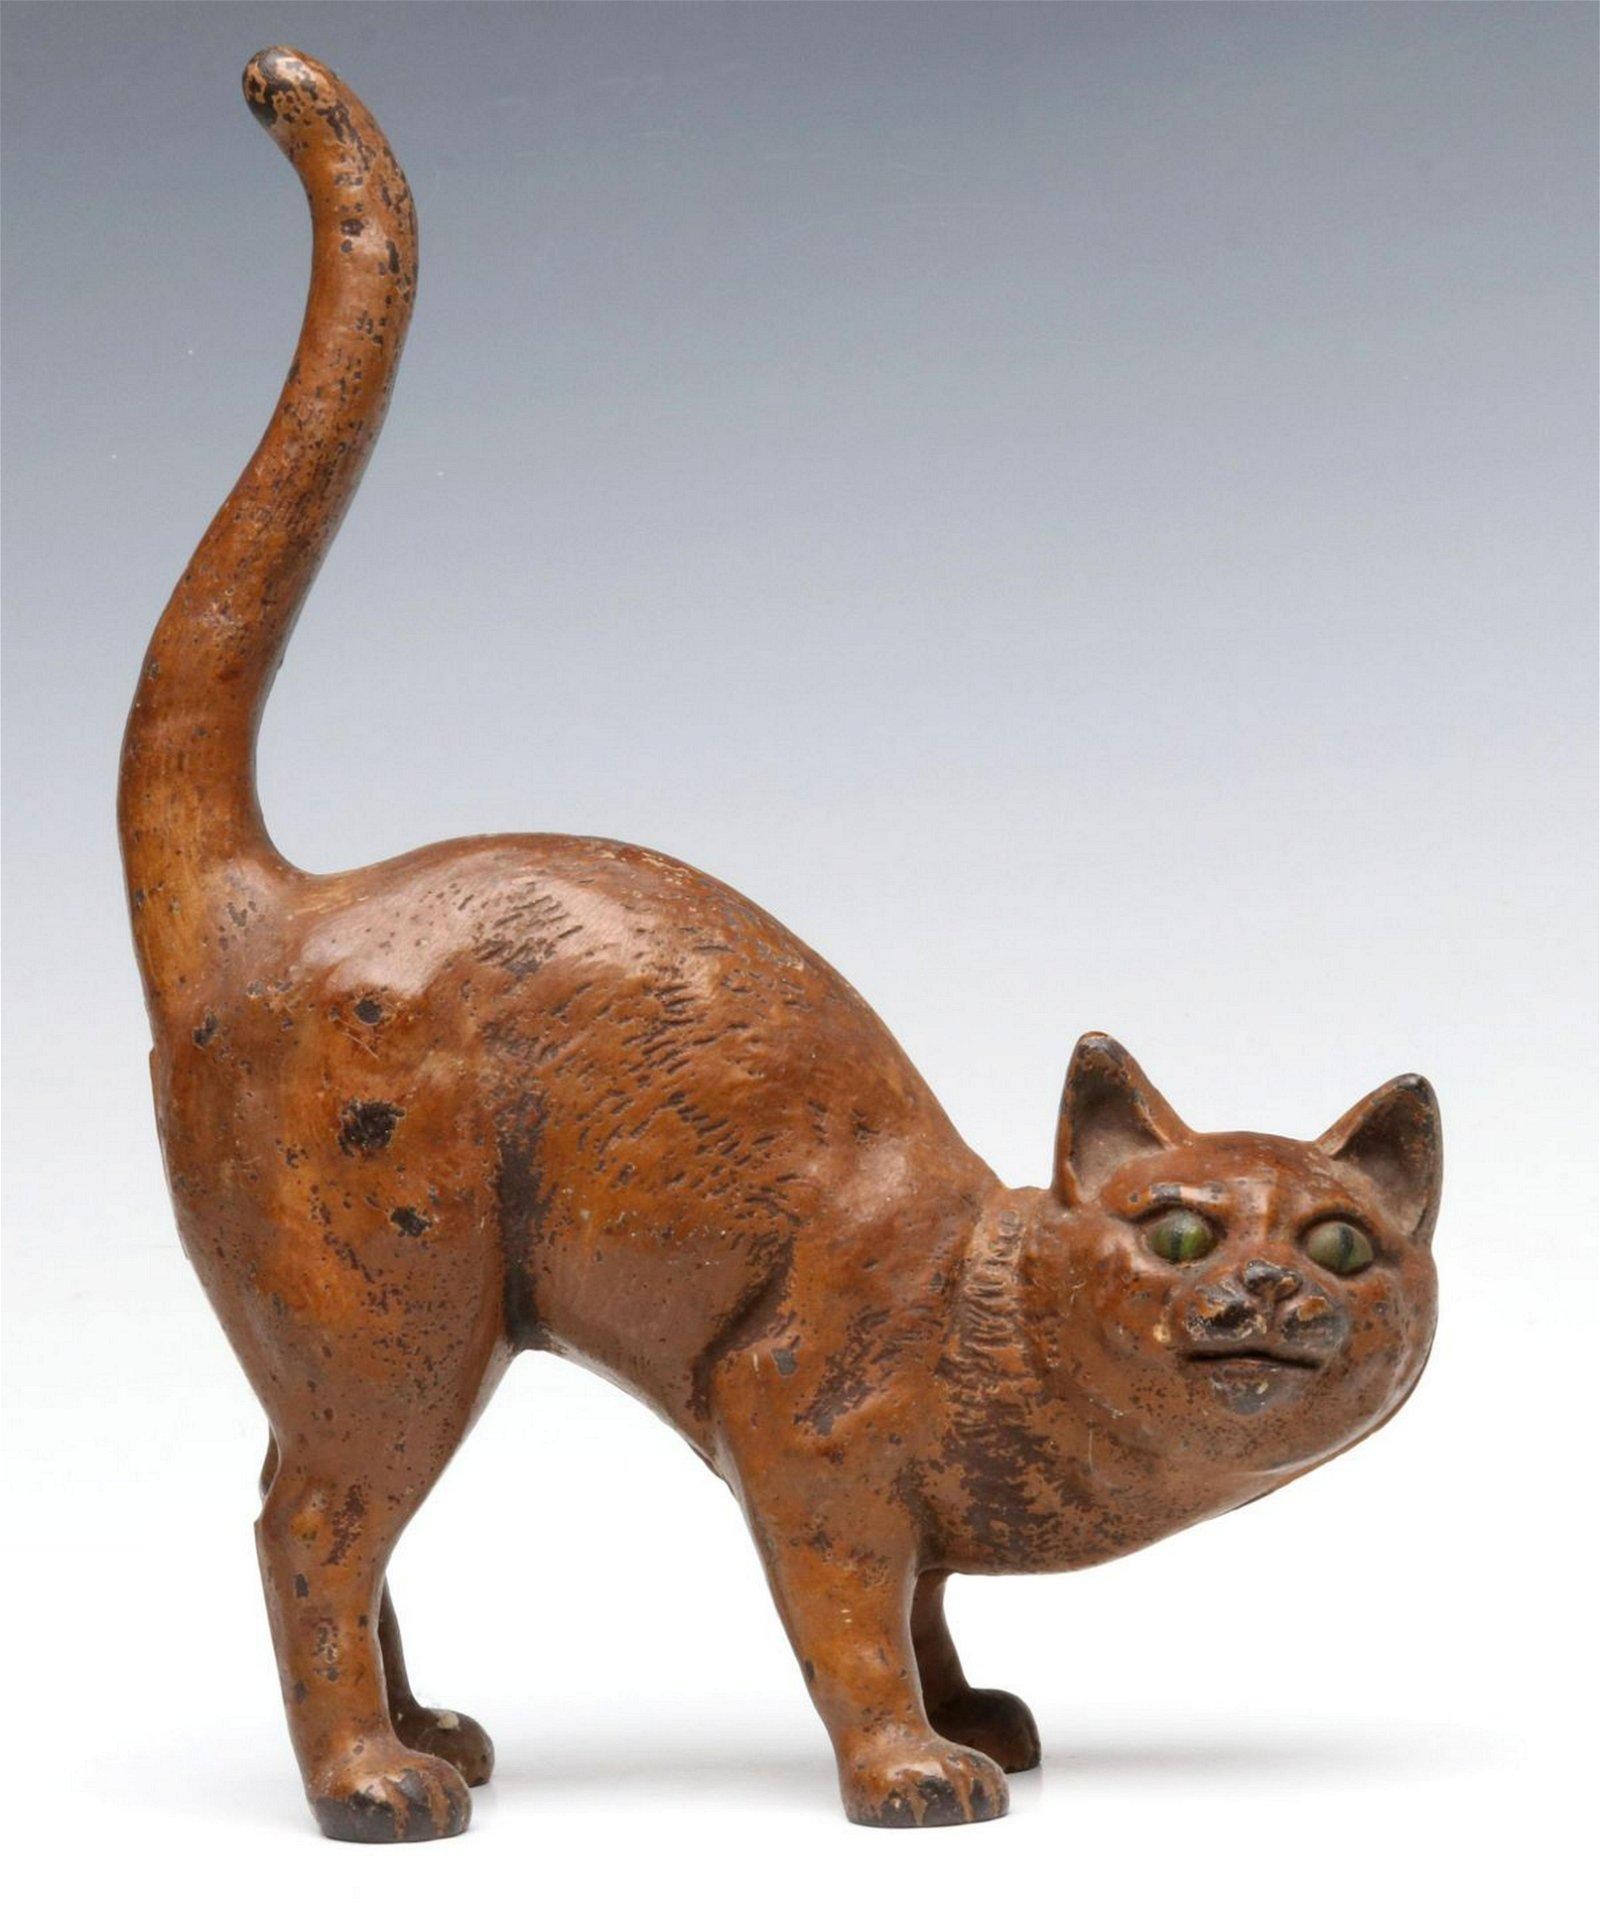 A HUBLEY GREEN-EYED CAT CAST IRON DOORSTOP NO. 216